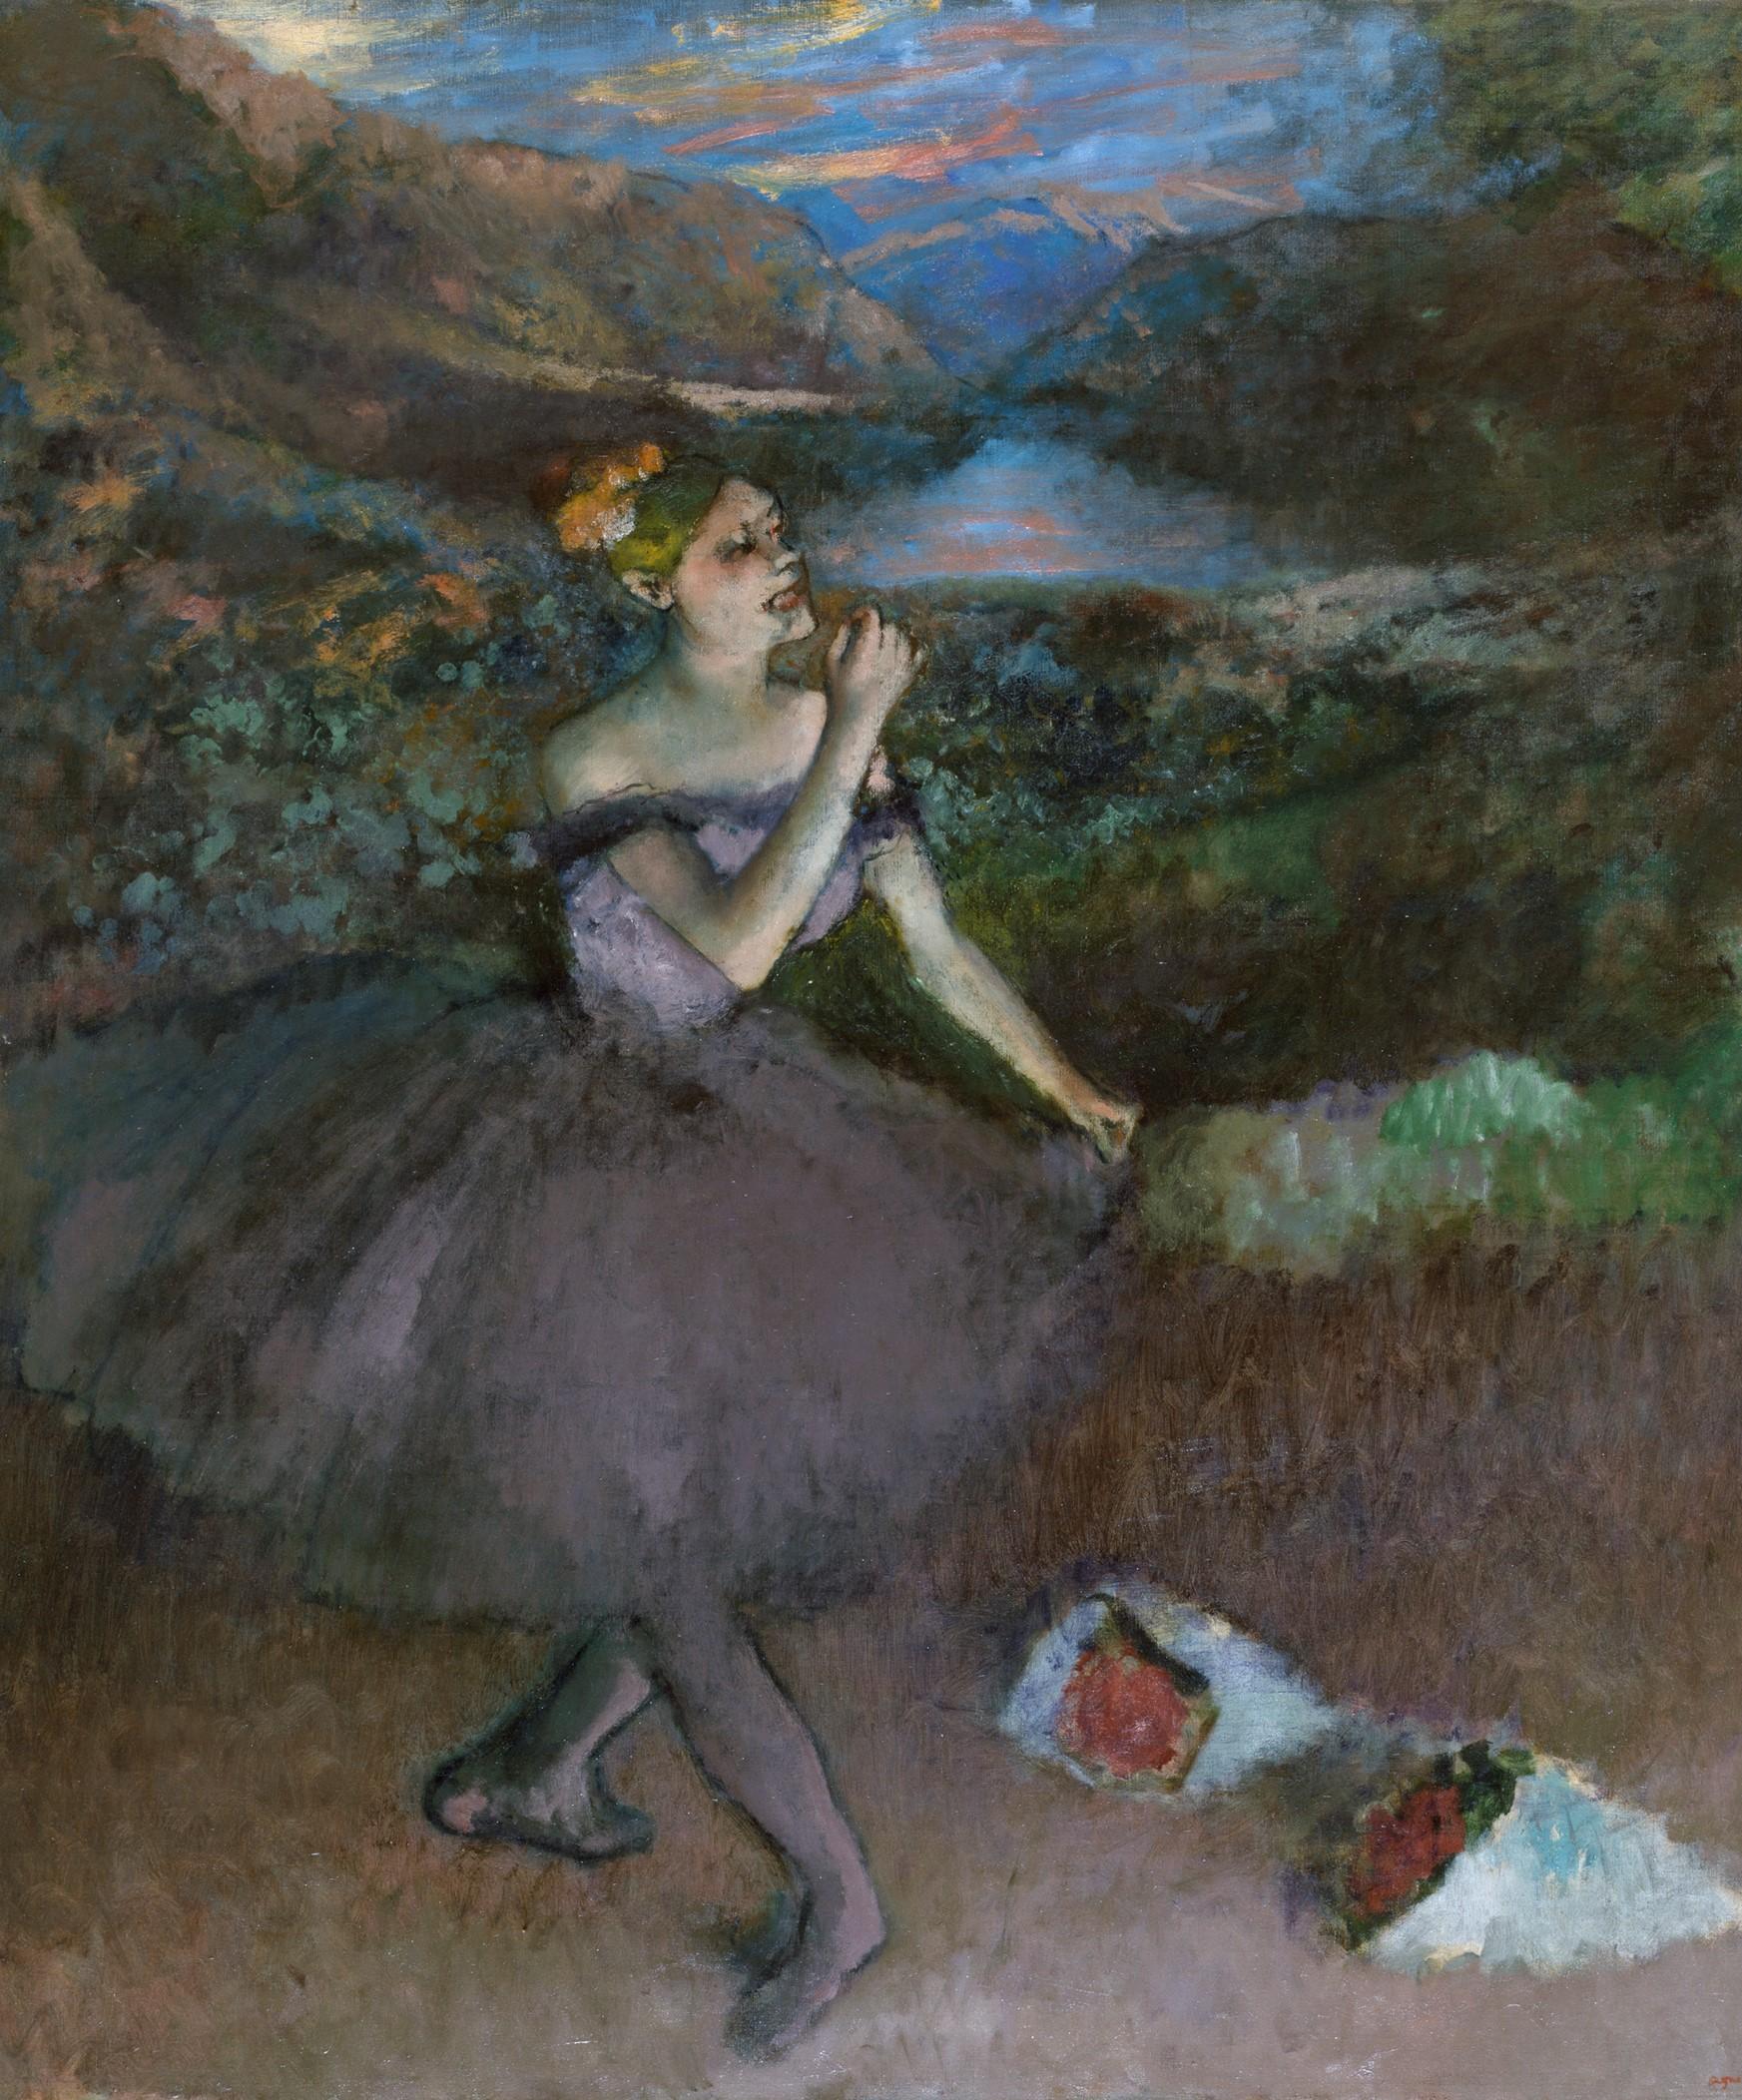 Edgar Degas, Ballerina con mazzi di fiori